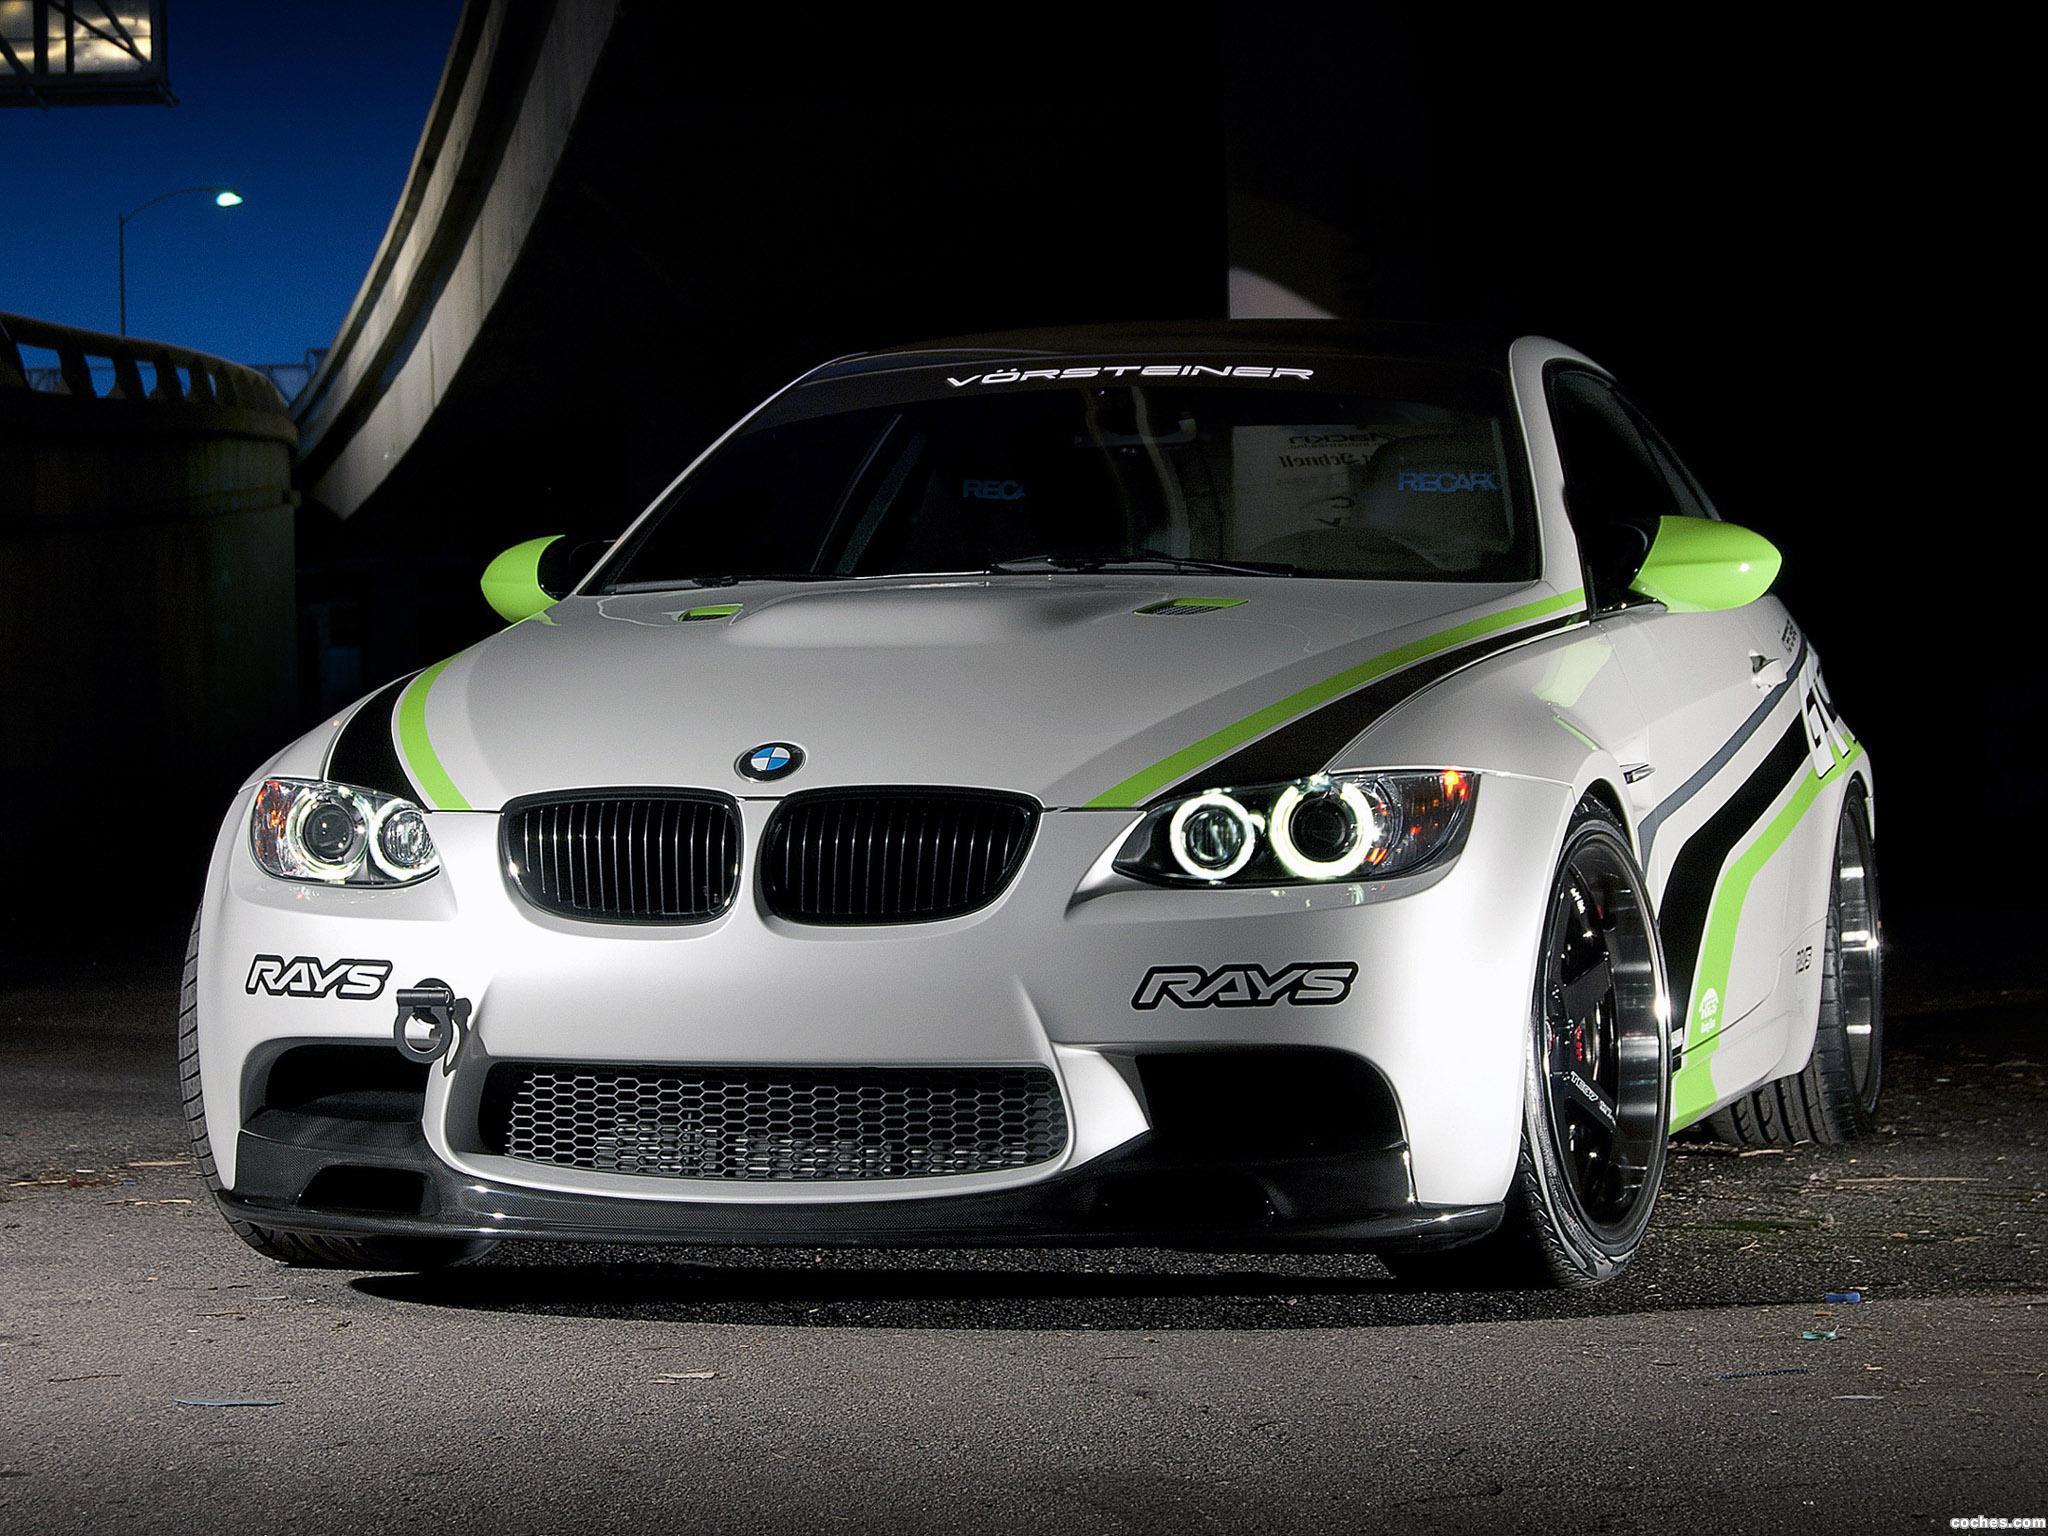 Foto 0 de BMW Vorsteiner Serie 3 M3 Coupe GTS-V E92 2011